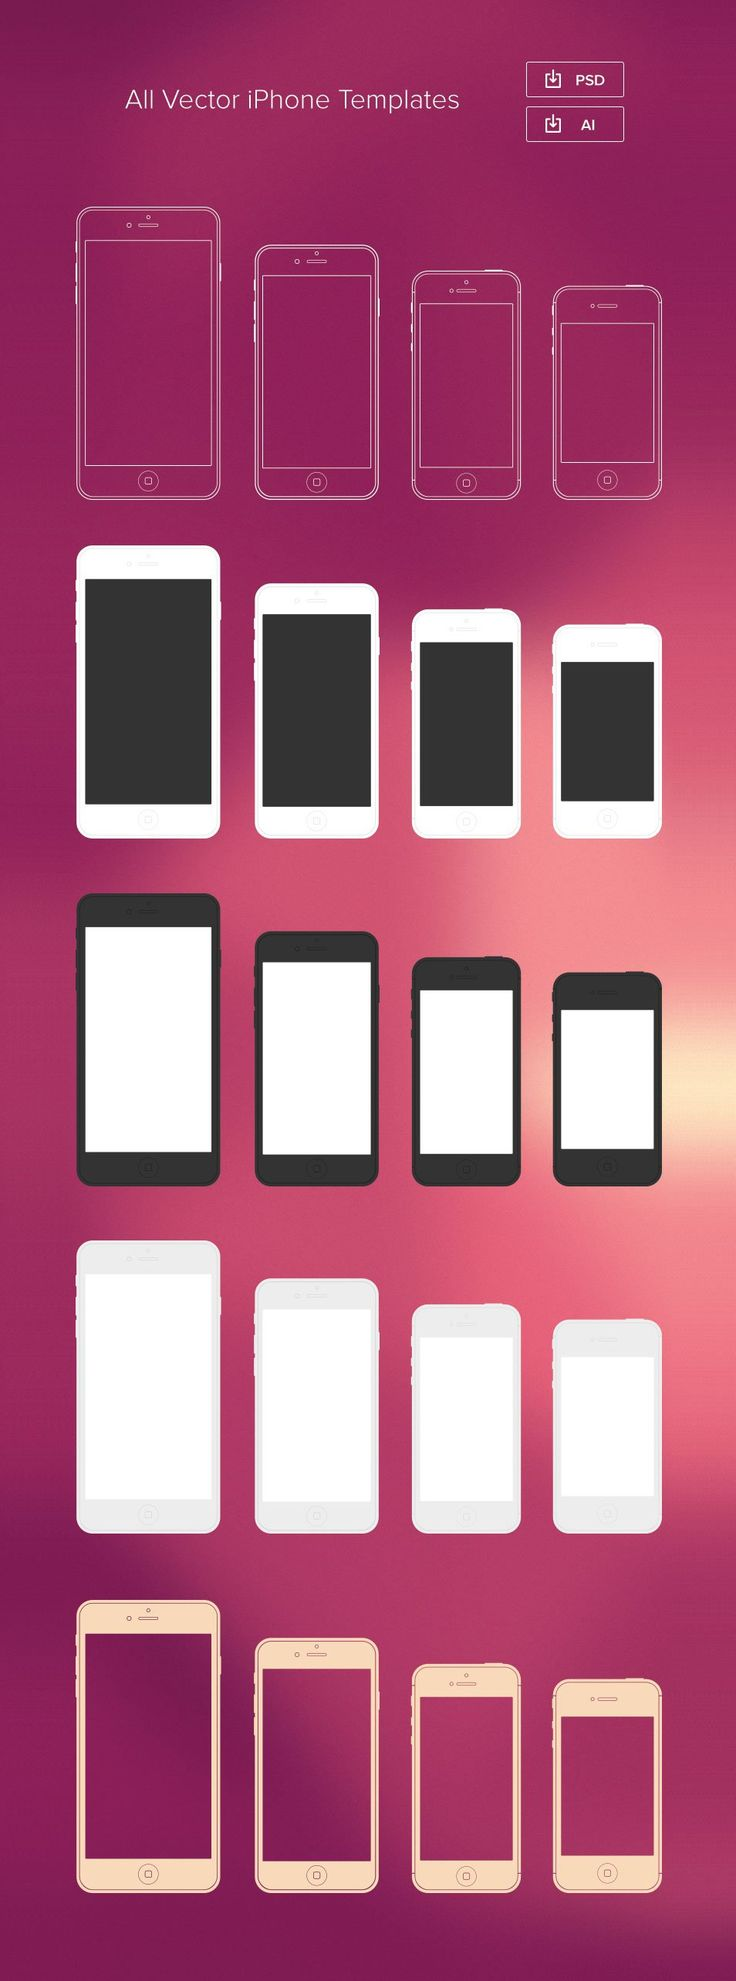 Best iPhone 6 Mockup Design Templates